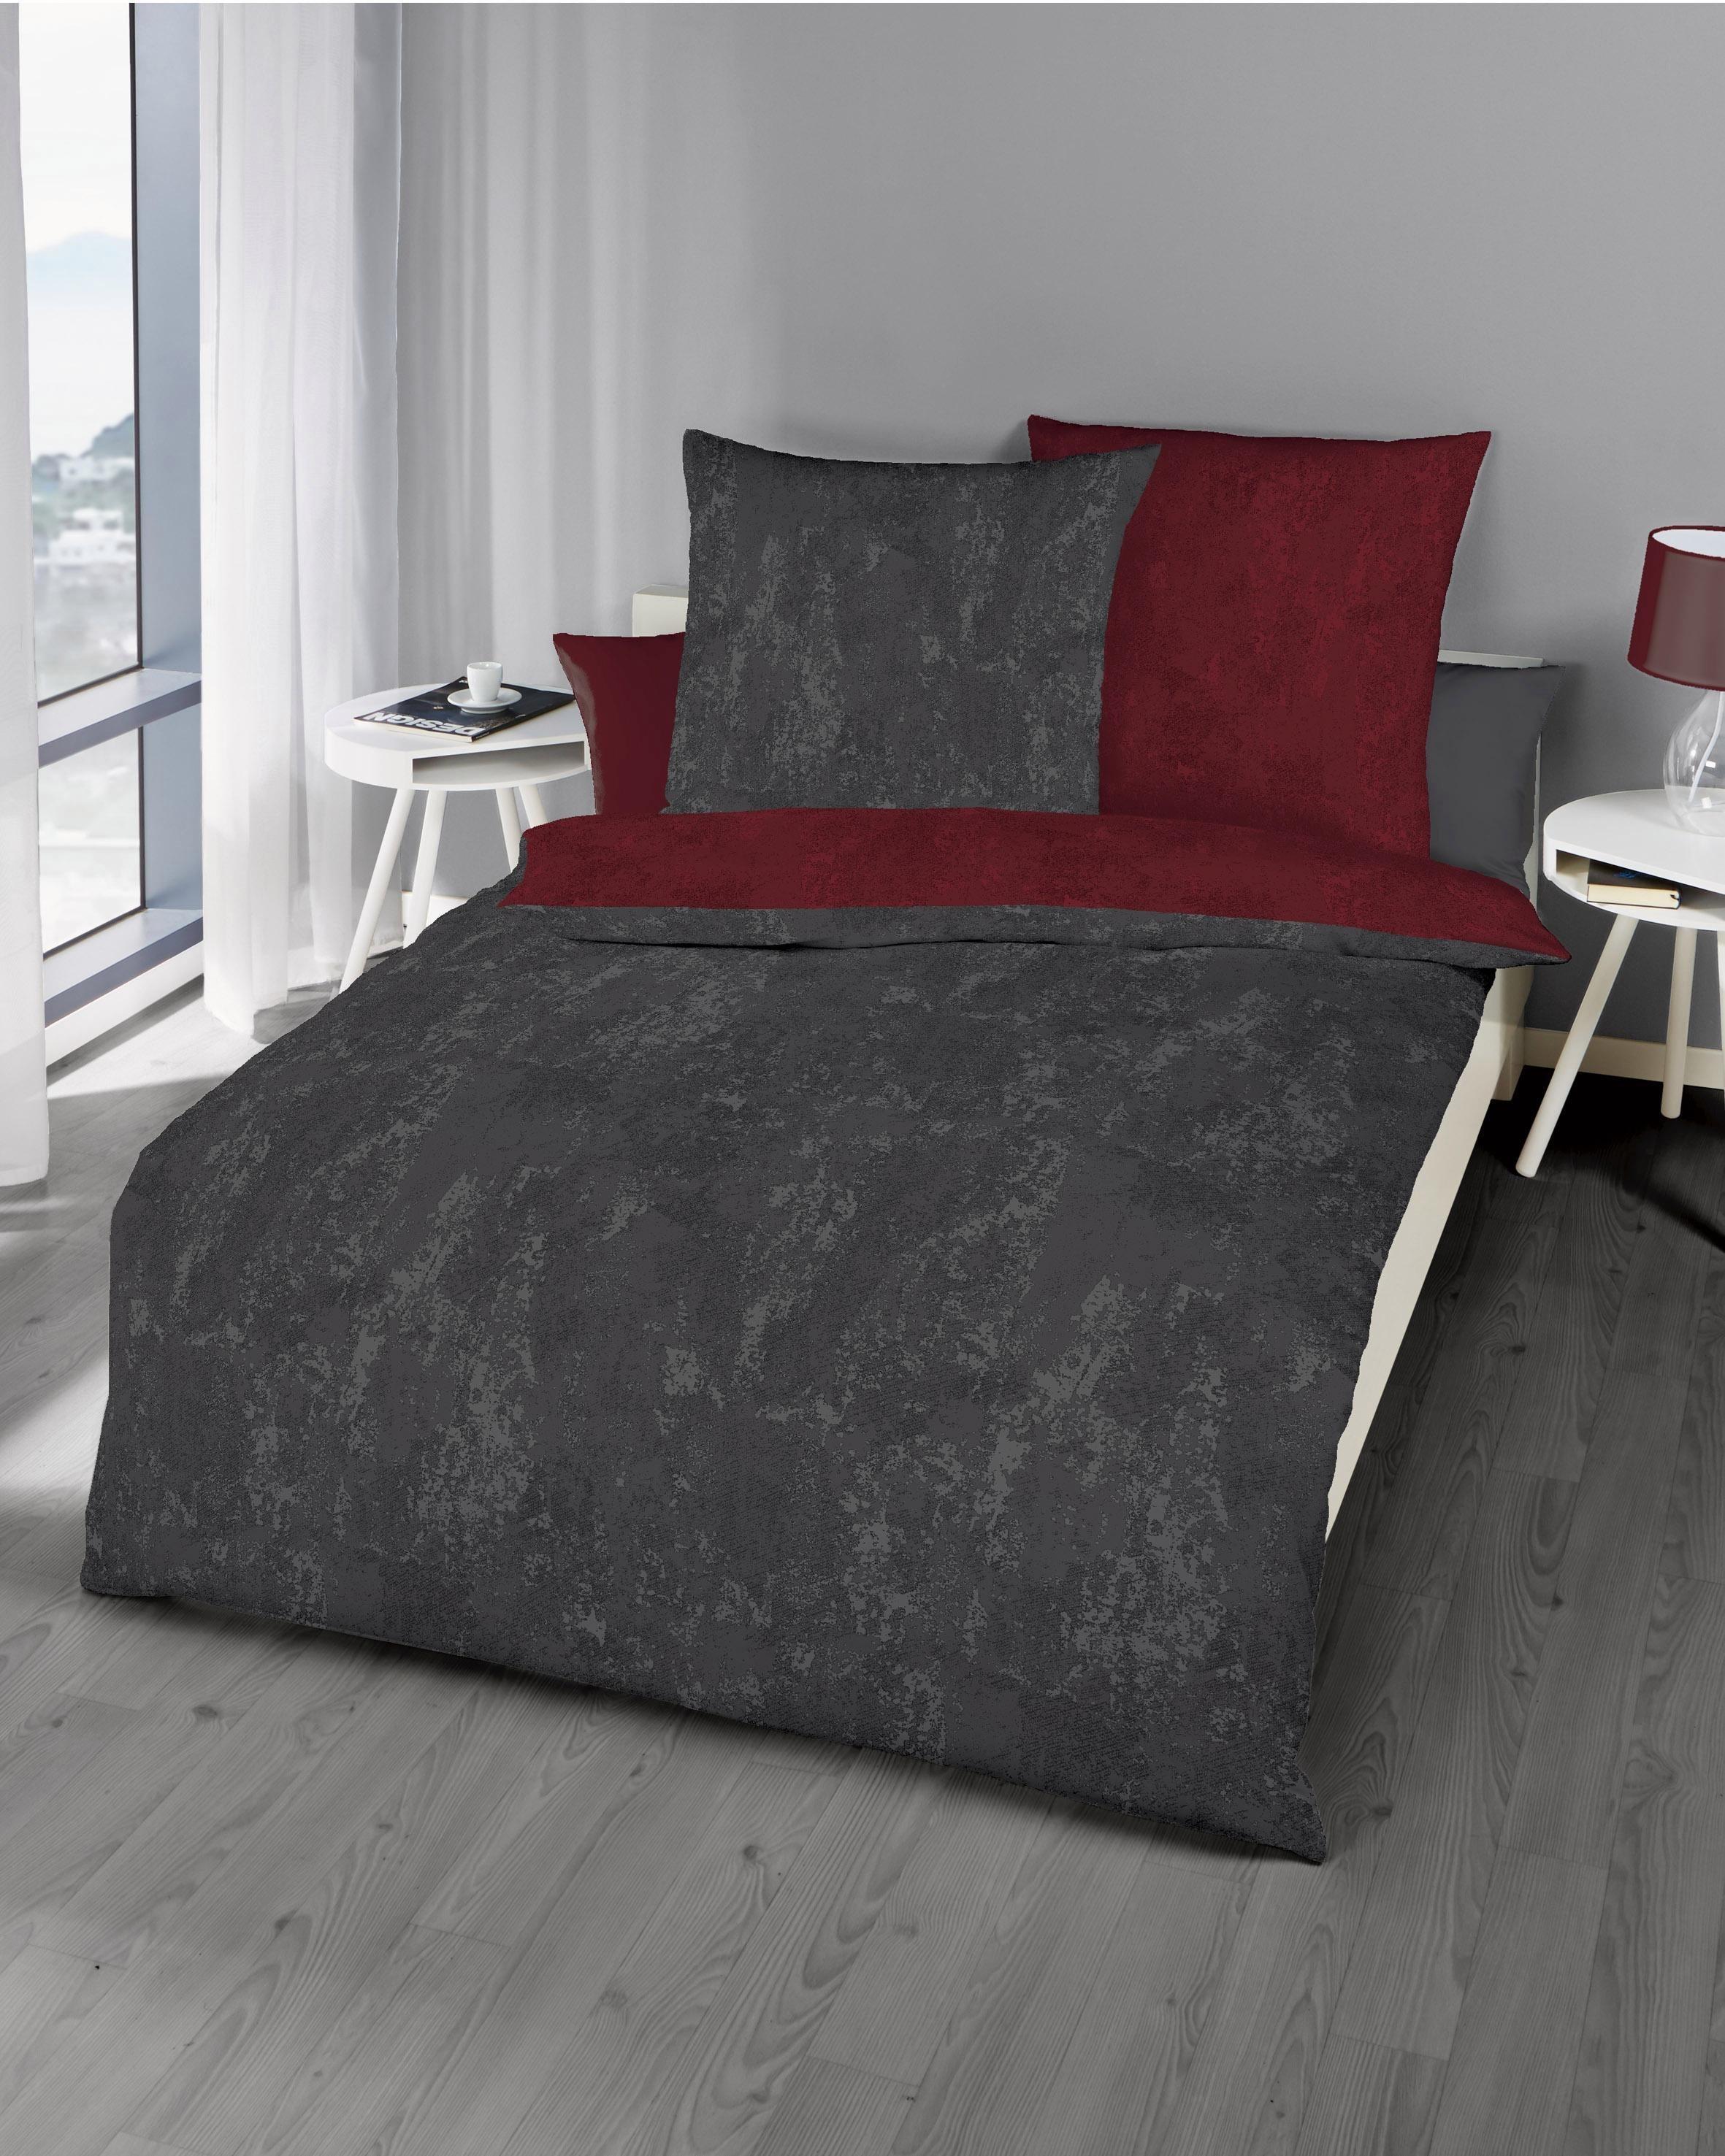 morteens bettw sche garnituren online kaufen m bel. Black Bedroom Furniture Sets. Home Design Ideas